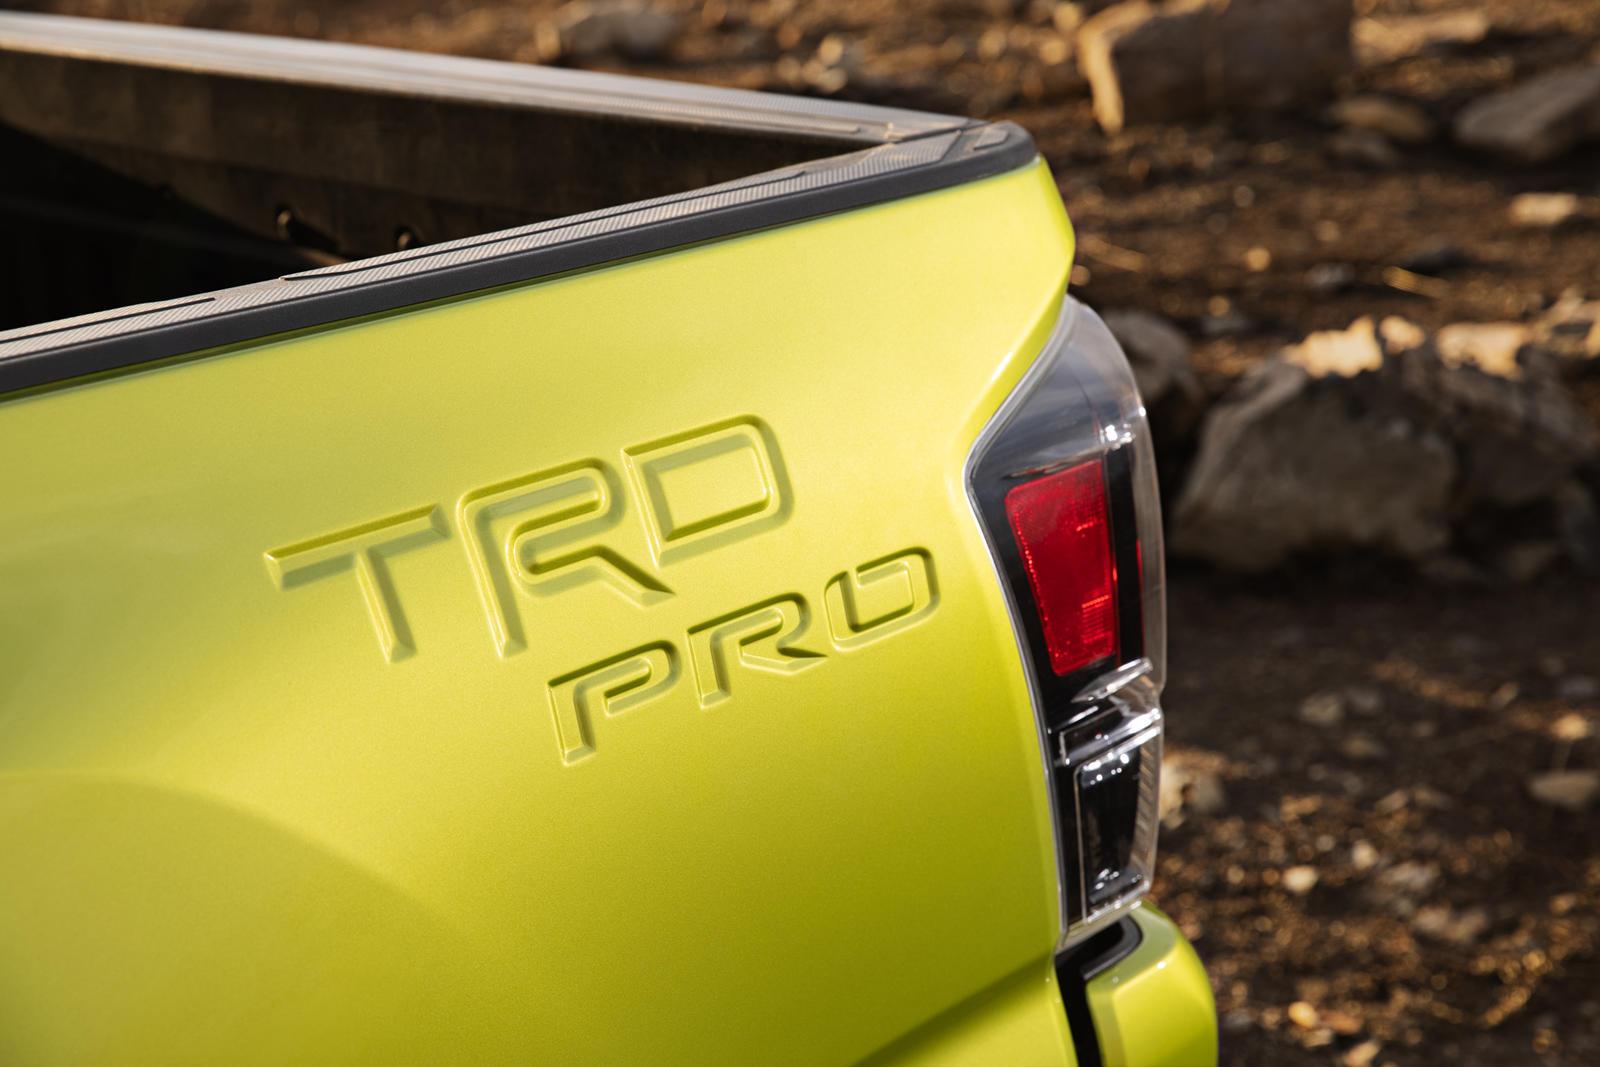 Toyota-ra-mắt-Tacoma-TRD-Pro-2022 (2).jpg